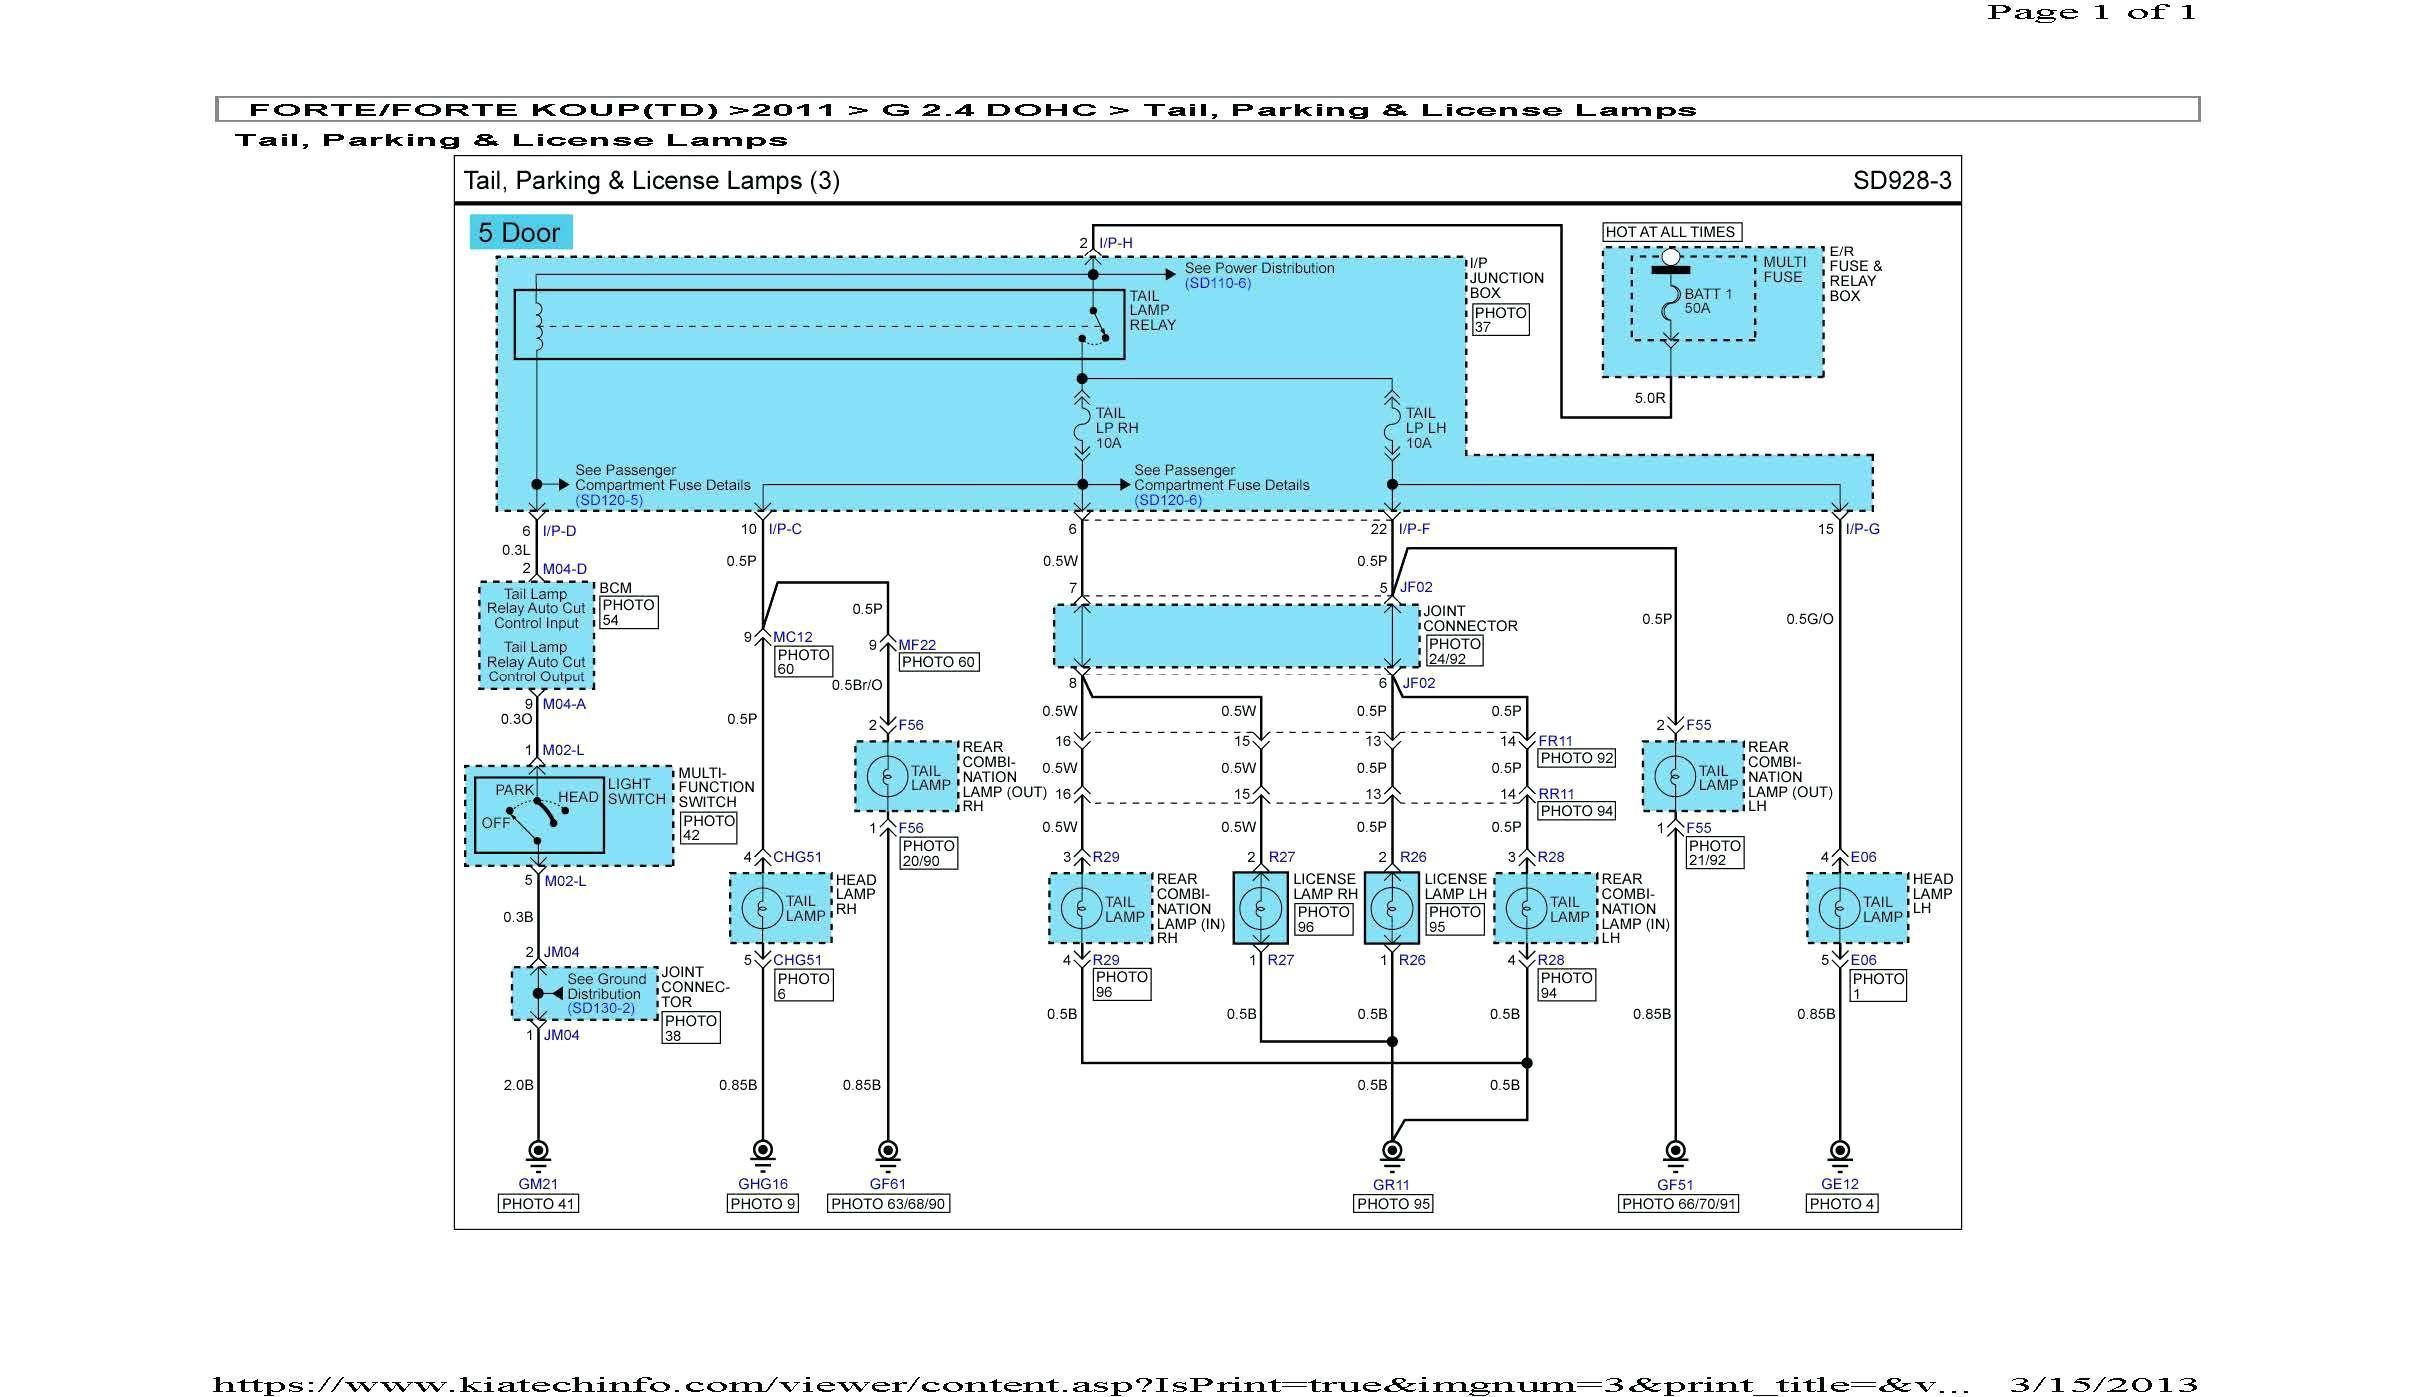 fuse box for kia spectra 2007 wiring diagram data nl 2007 kium sportage fuse panel wiring diagram for 2006 kia sportage 2009 kia spectra fuse diagram